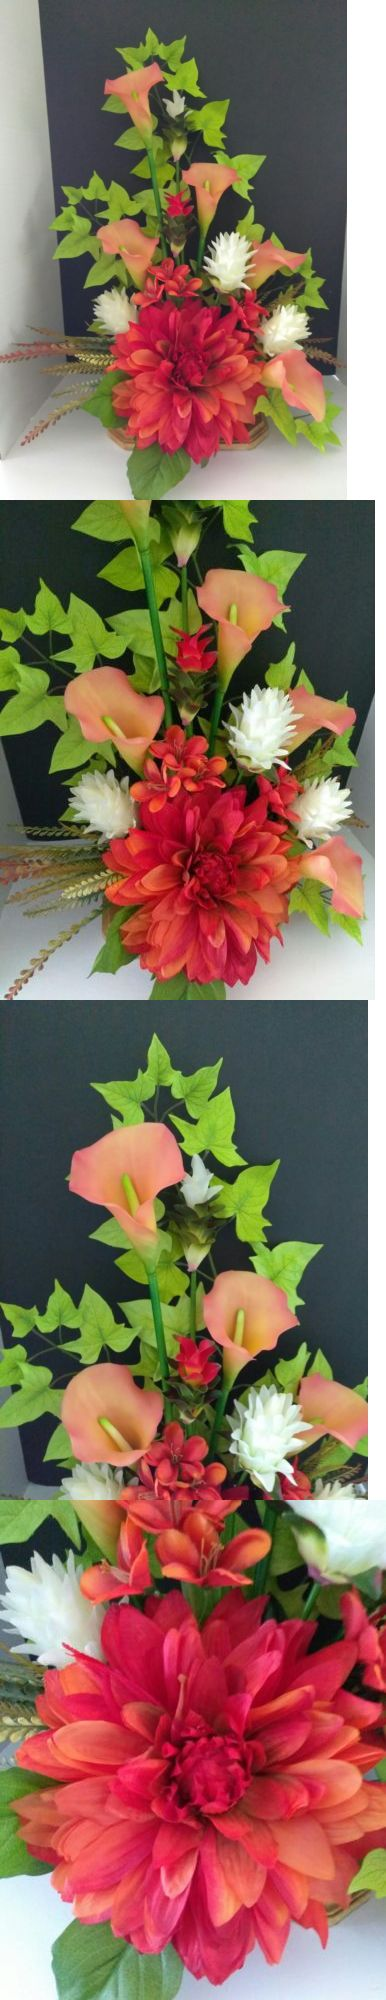 Floral D cor 4959: Tropical Silk Flower Floral Arrangement, Hotel Office Decor -> BUY IT NOW ONLY: $55.95 on eBay!